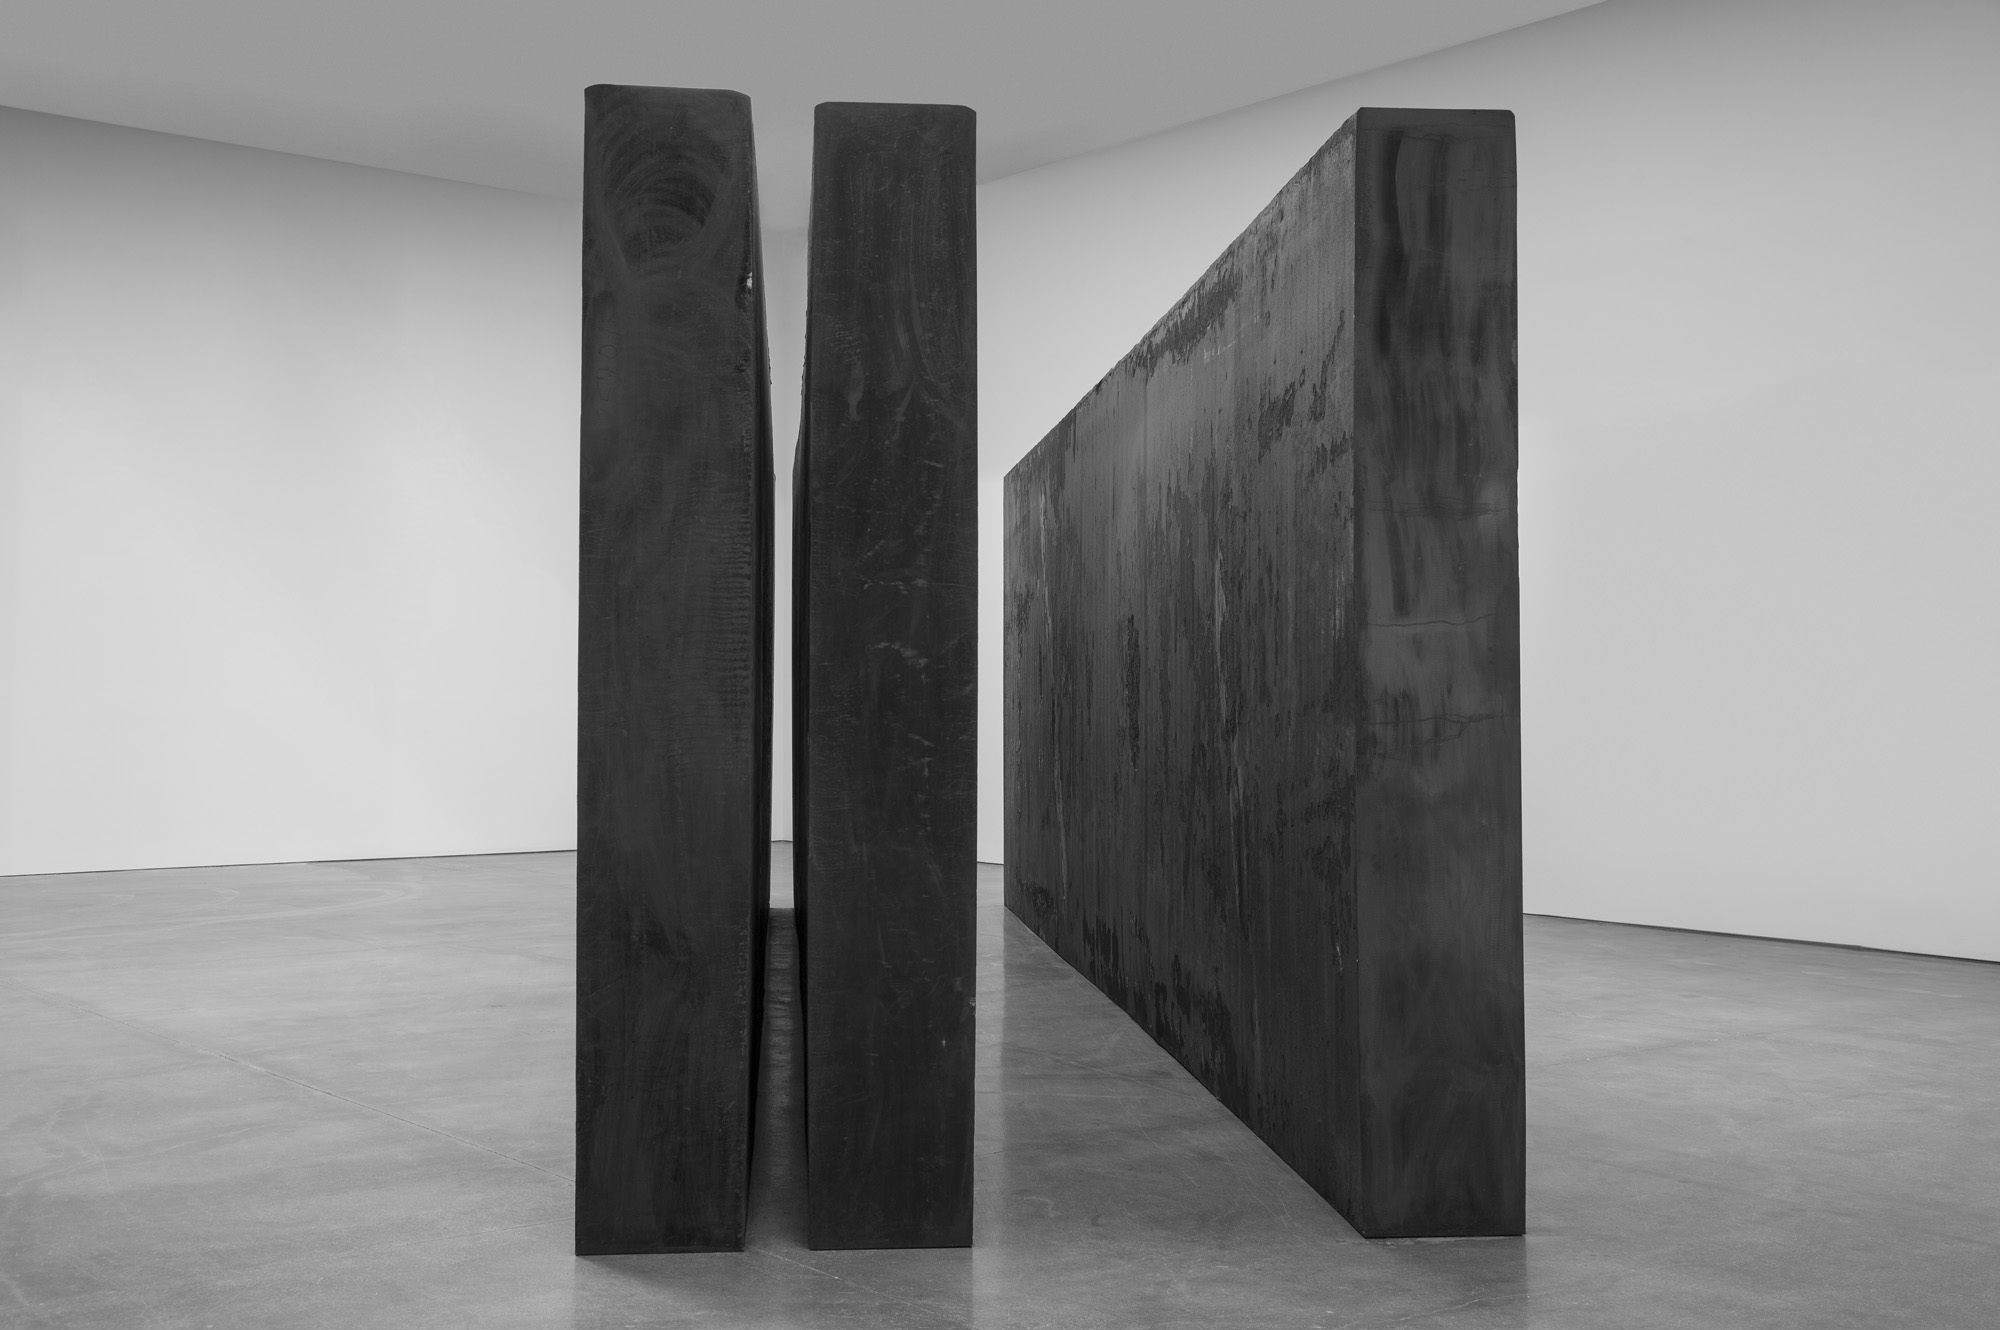 "RICHARD SERRA Through, 2015 Forged steel Three slabs, each: 9' 2"" x 29' 6"" x 16"" (2.8 m x 9 m x 40.6 cm) Overall: 9' 2"" x 29' 6"" x 92"" (2.8 m x 9 m x 234.3 cm) © Richard Serra. Photograph by Cristiano Mascaro."